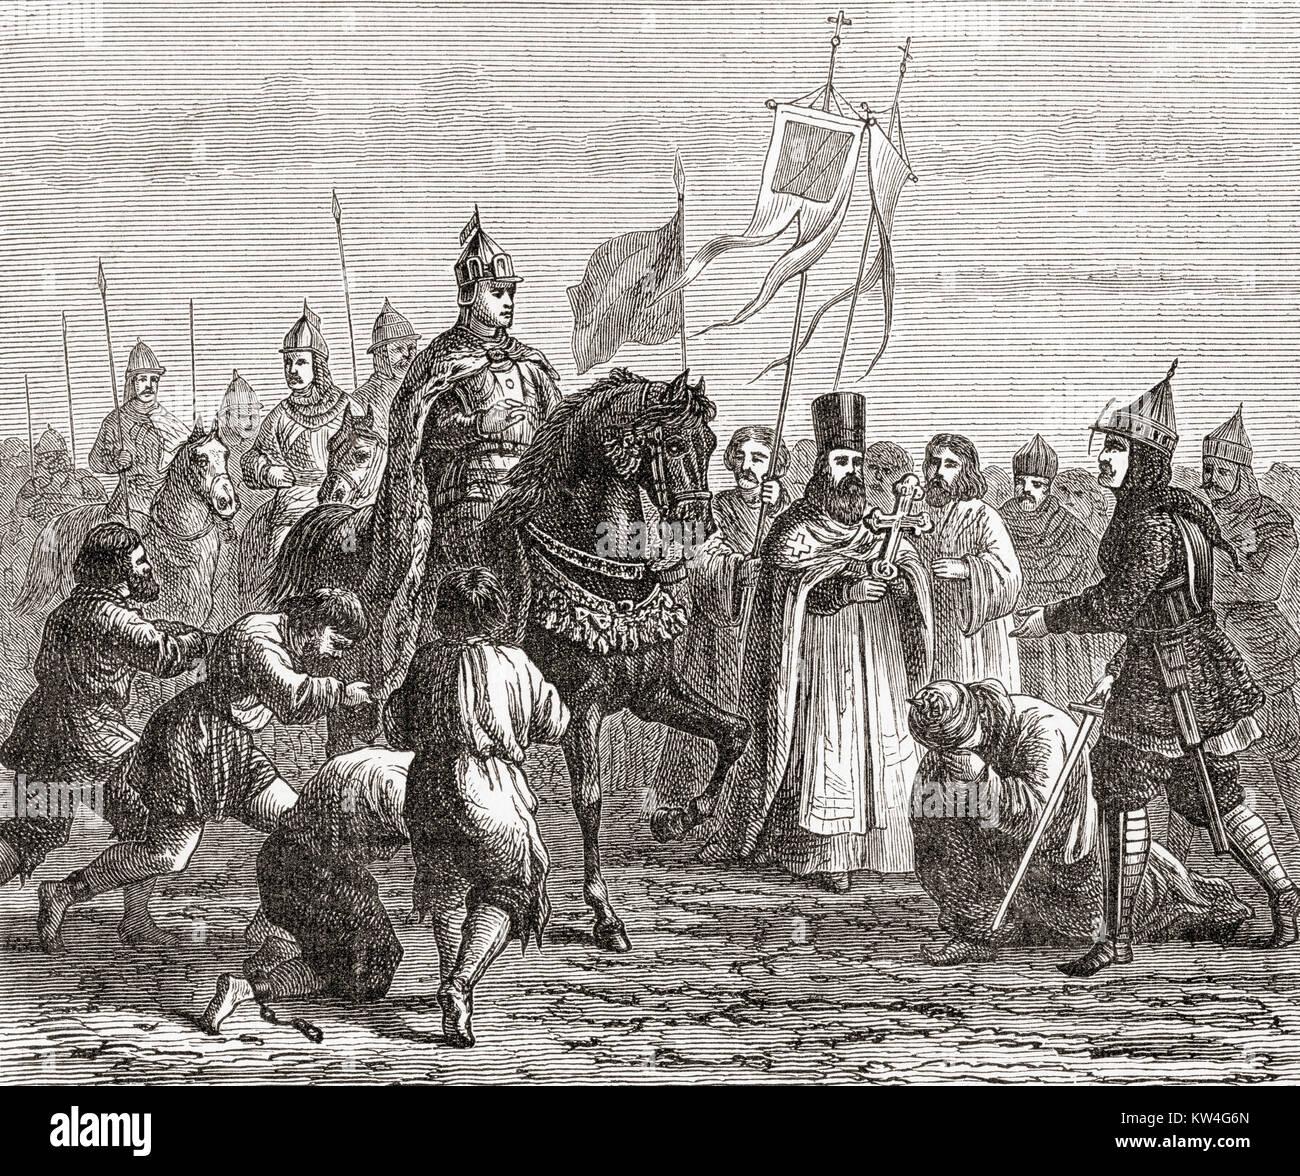 Ivan the Terrible entering Kazan in 1552.  Ivan IV Vasilyevich, 1530 – 1584, aka Ivan the Terrible or Ivan the Fearsome. - Stock Image